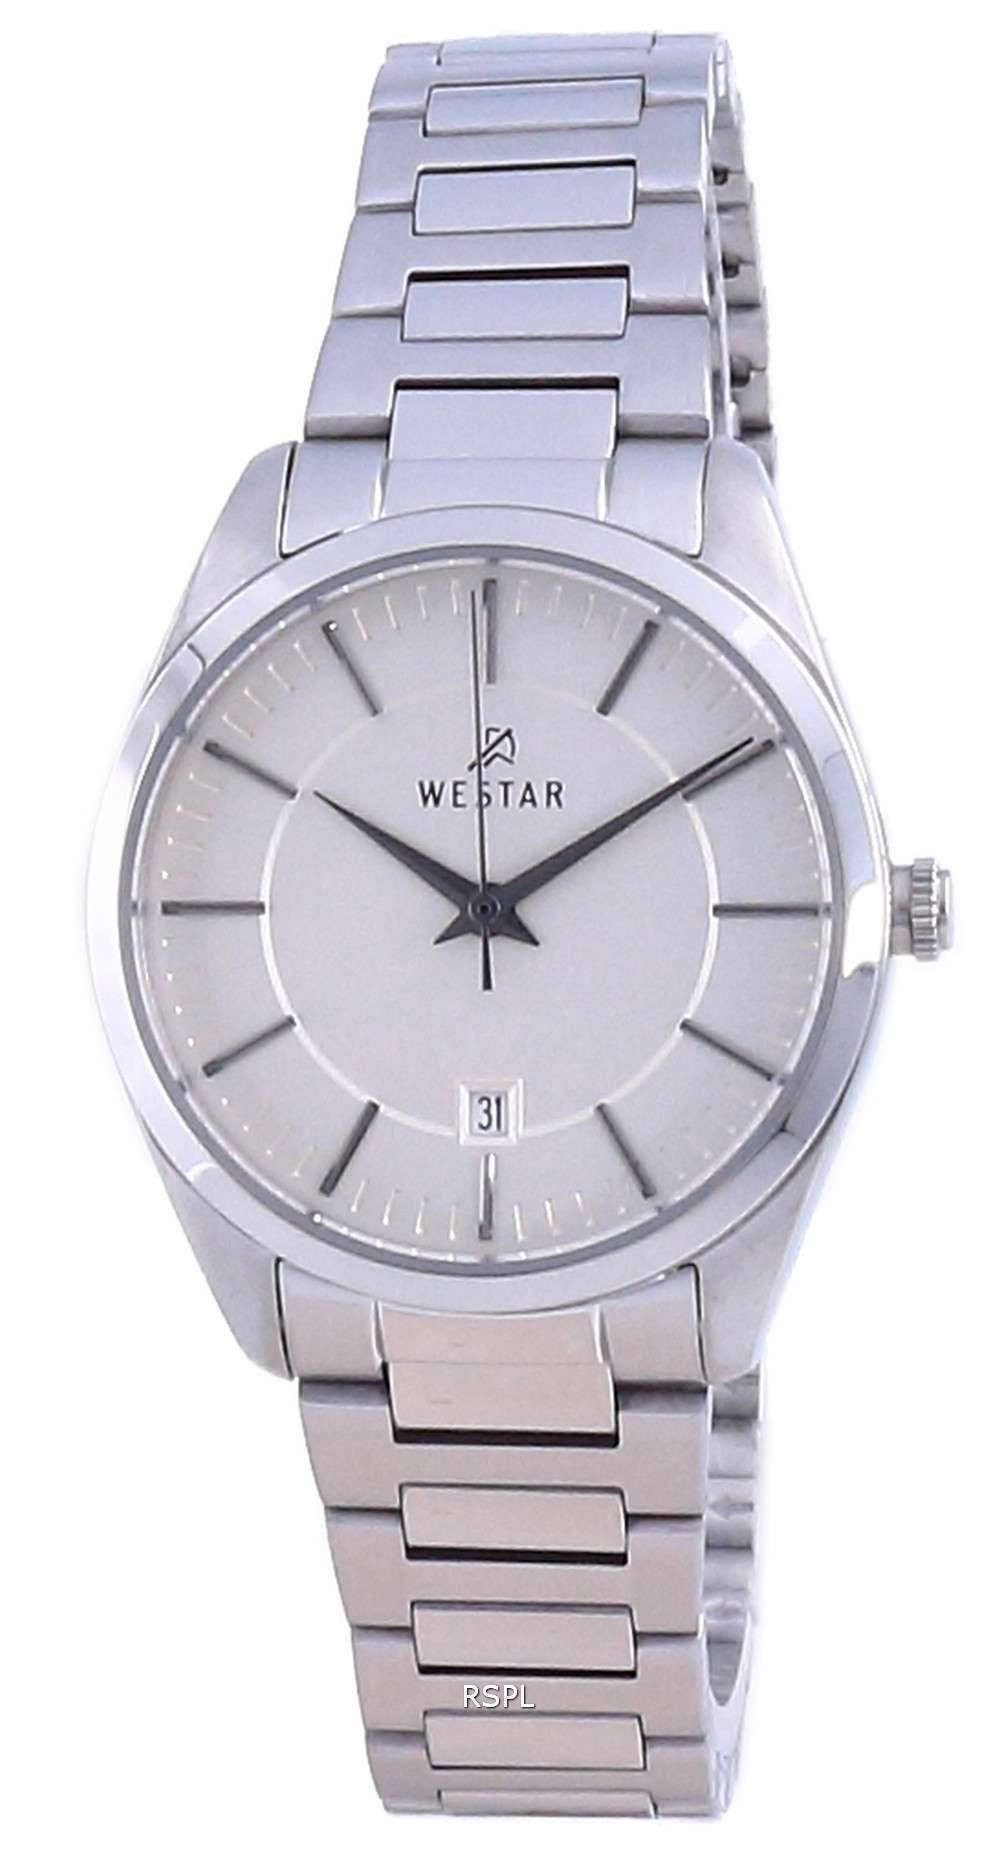 Westar Champagne Dial acero inoxidable cuarzo 40213 STN 102 Reloj para mujer